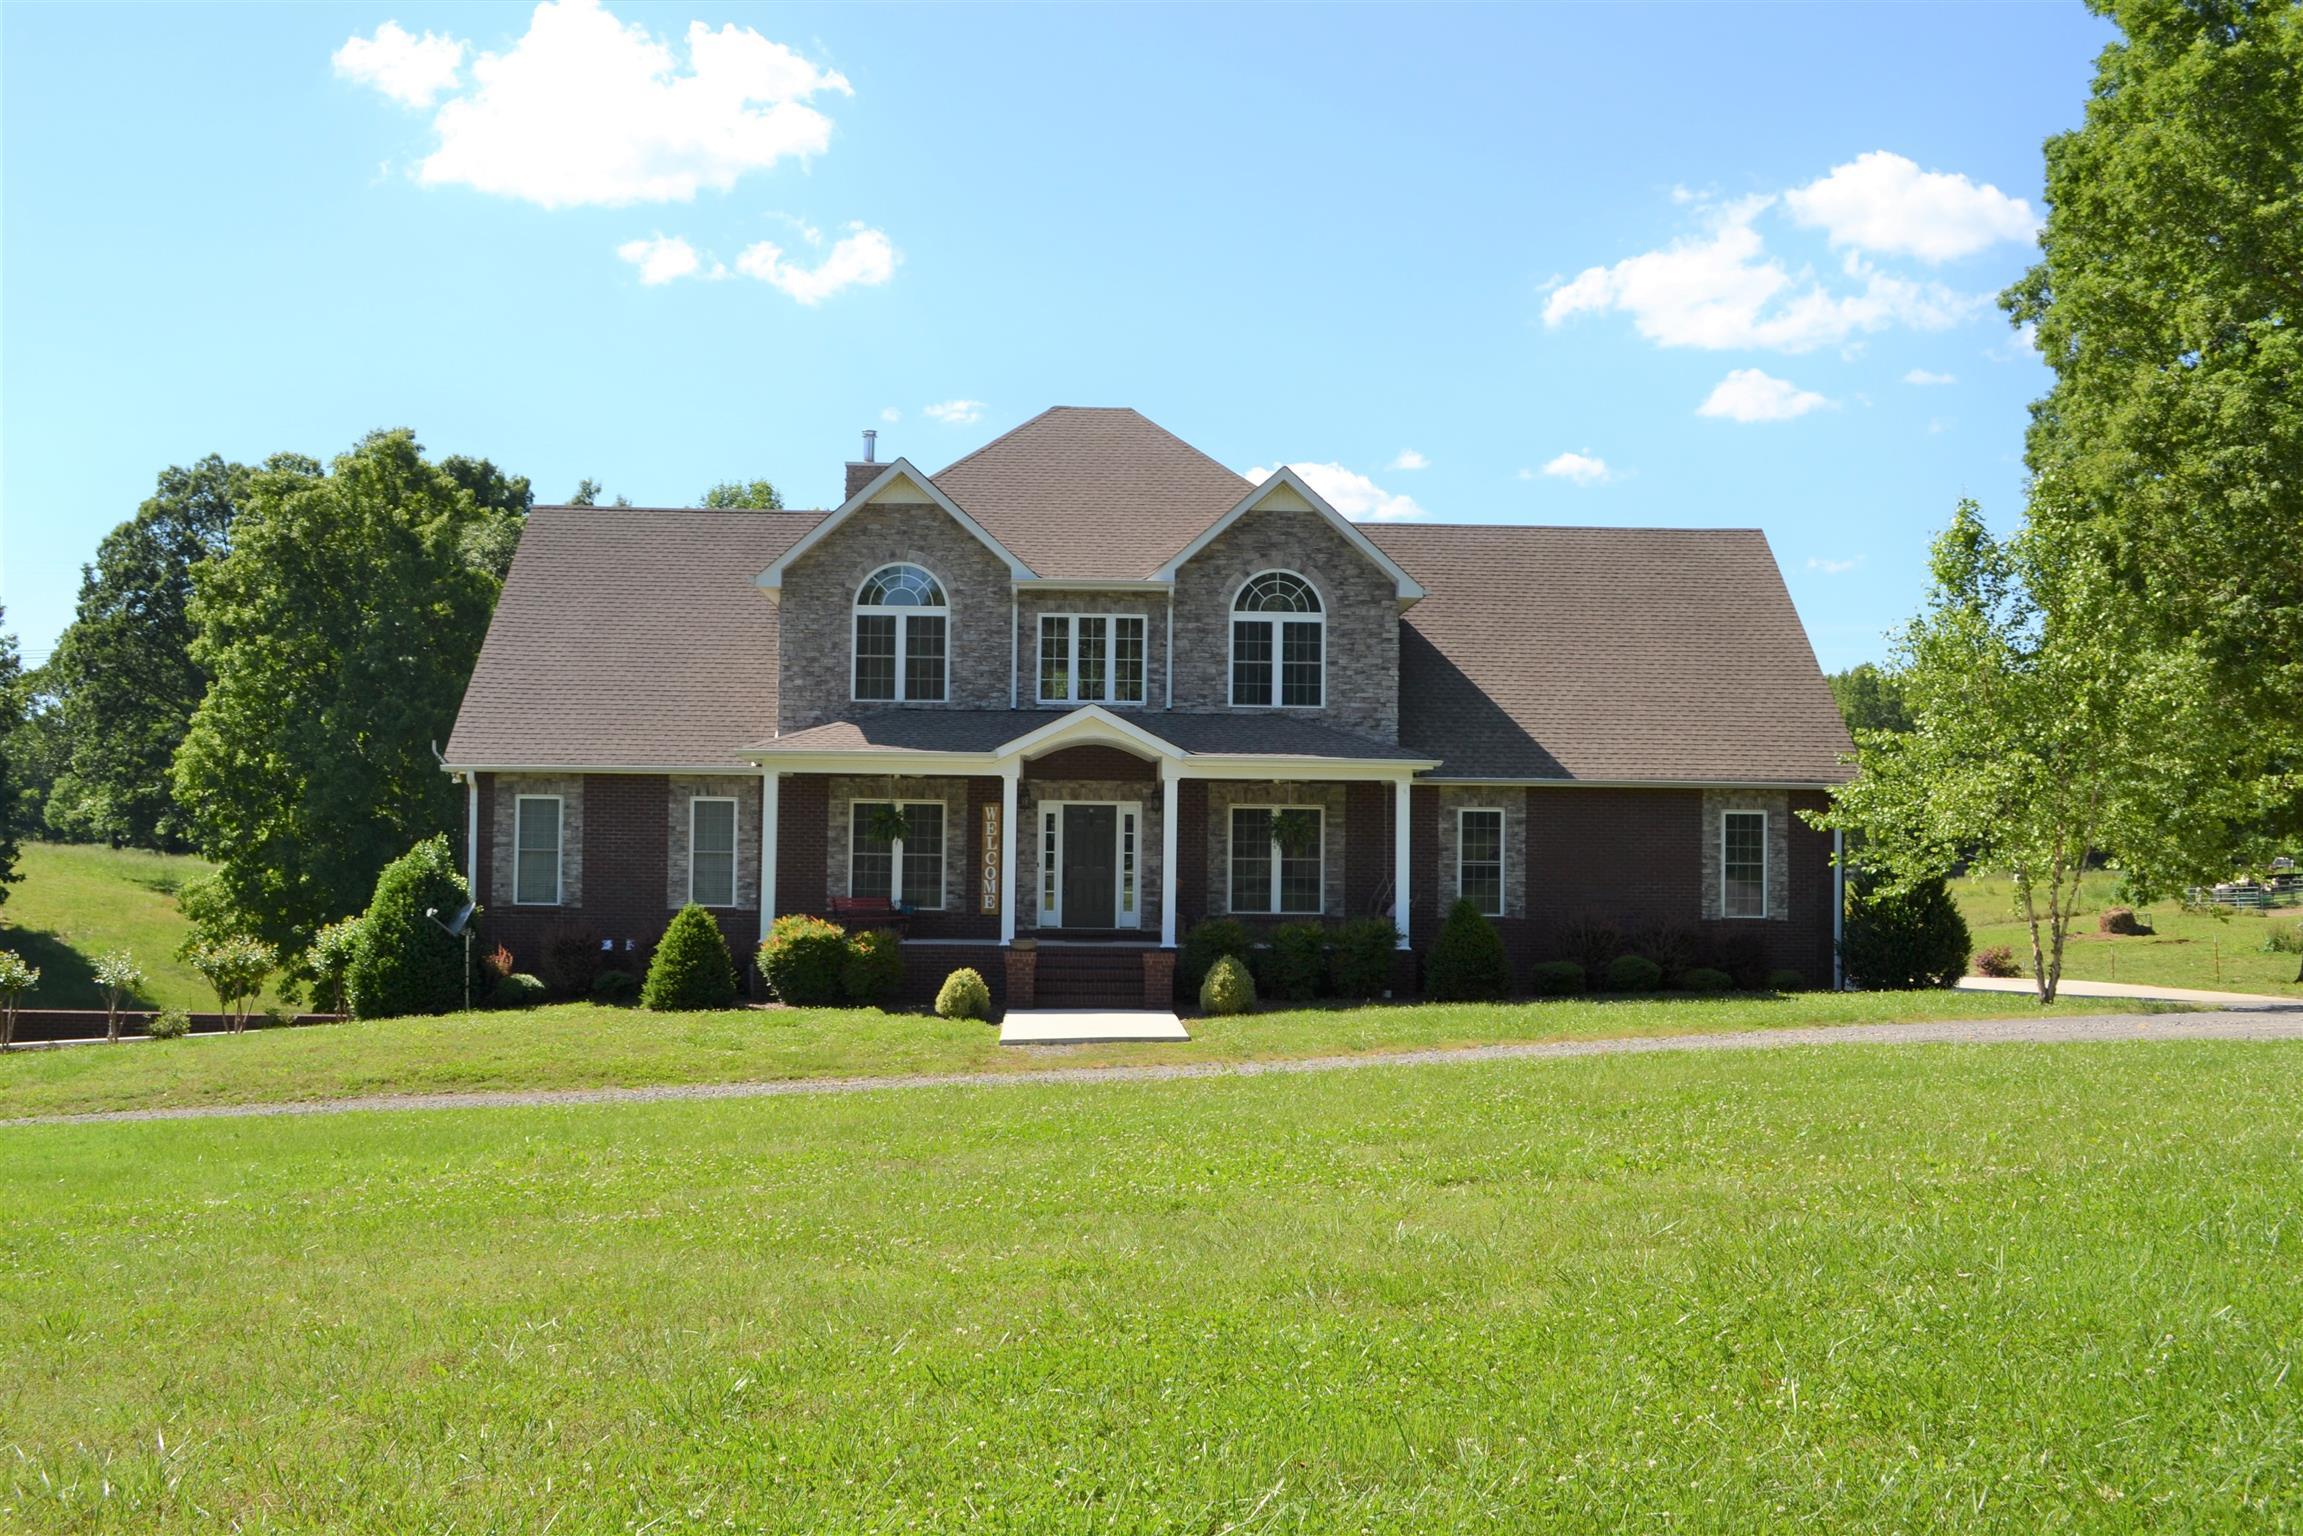 3656 Ledford Mill Rd, Tullahoma, TN 37388 - Tullahoma, TN real estate listing